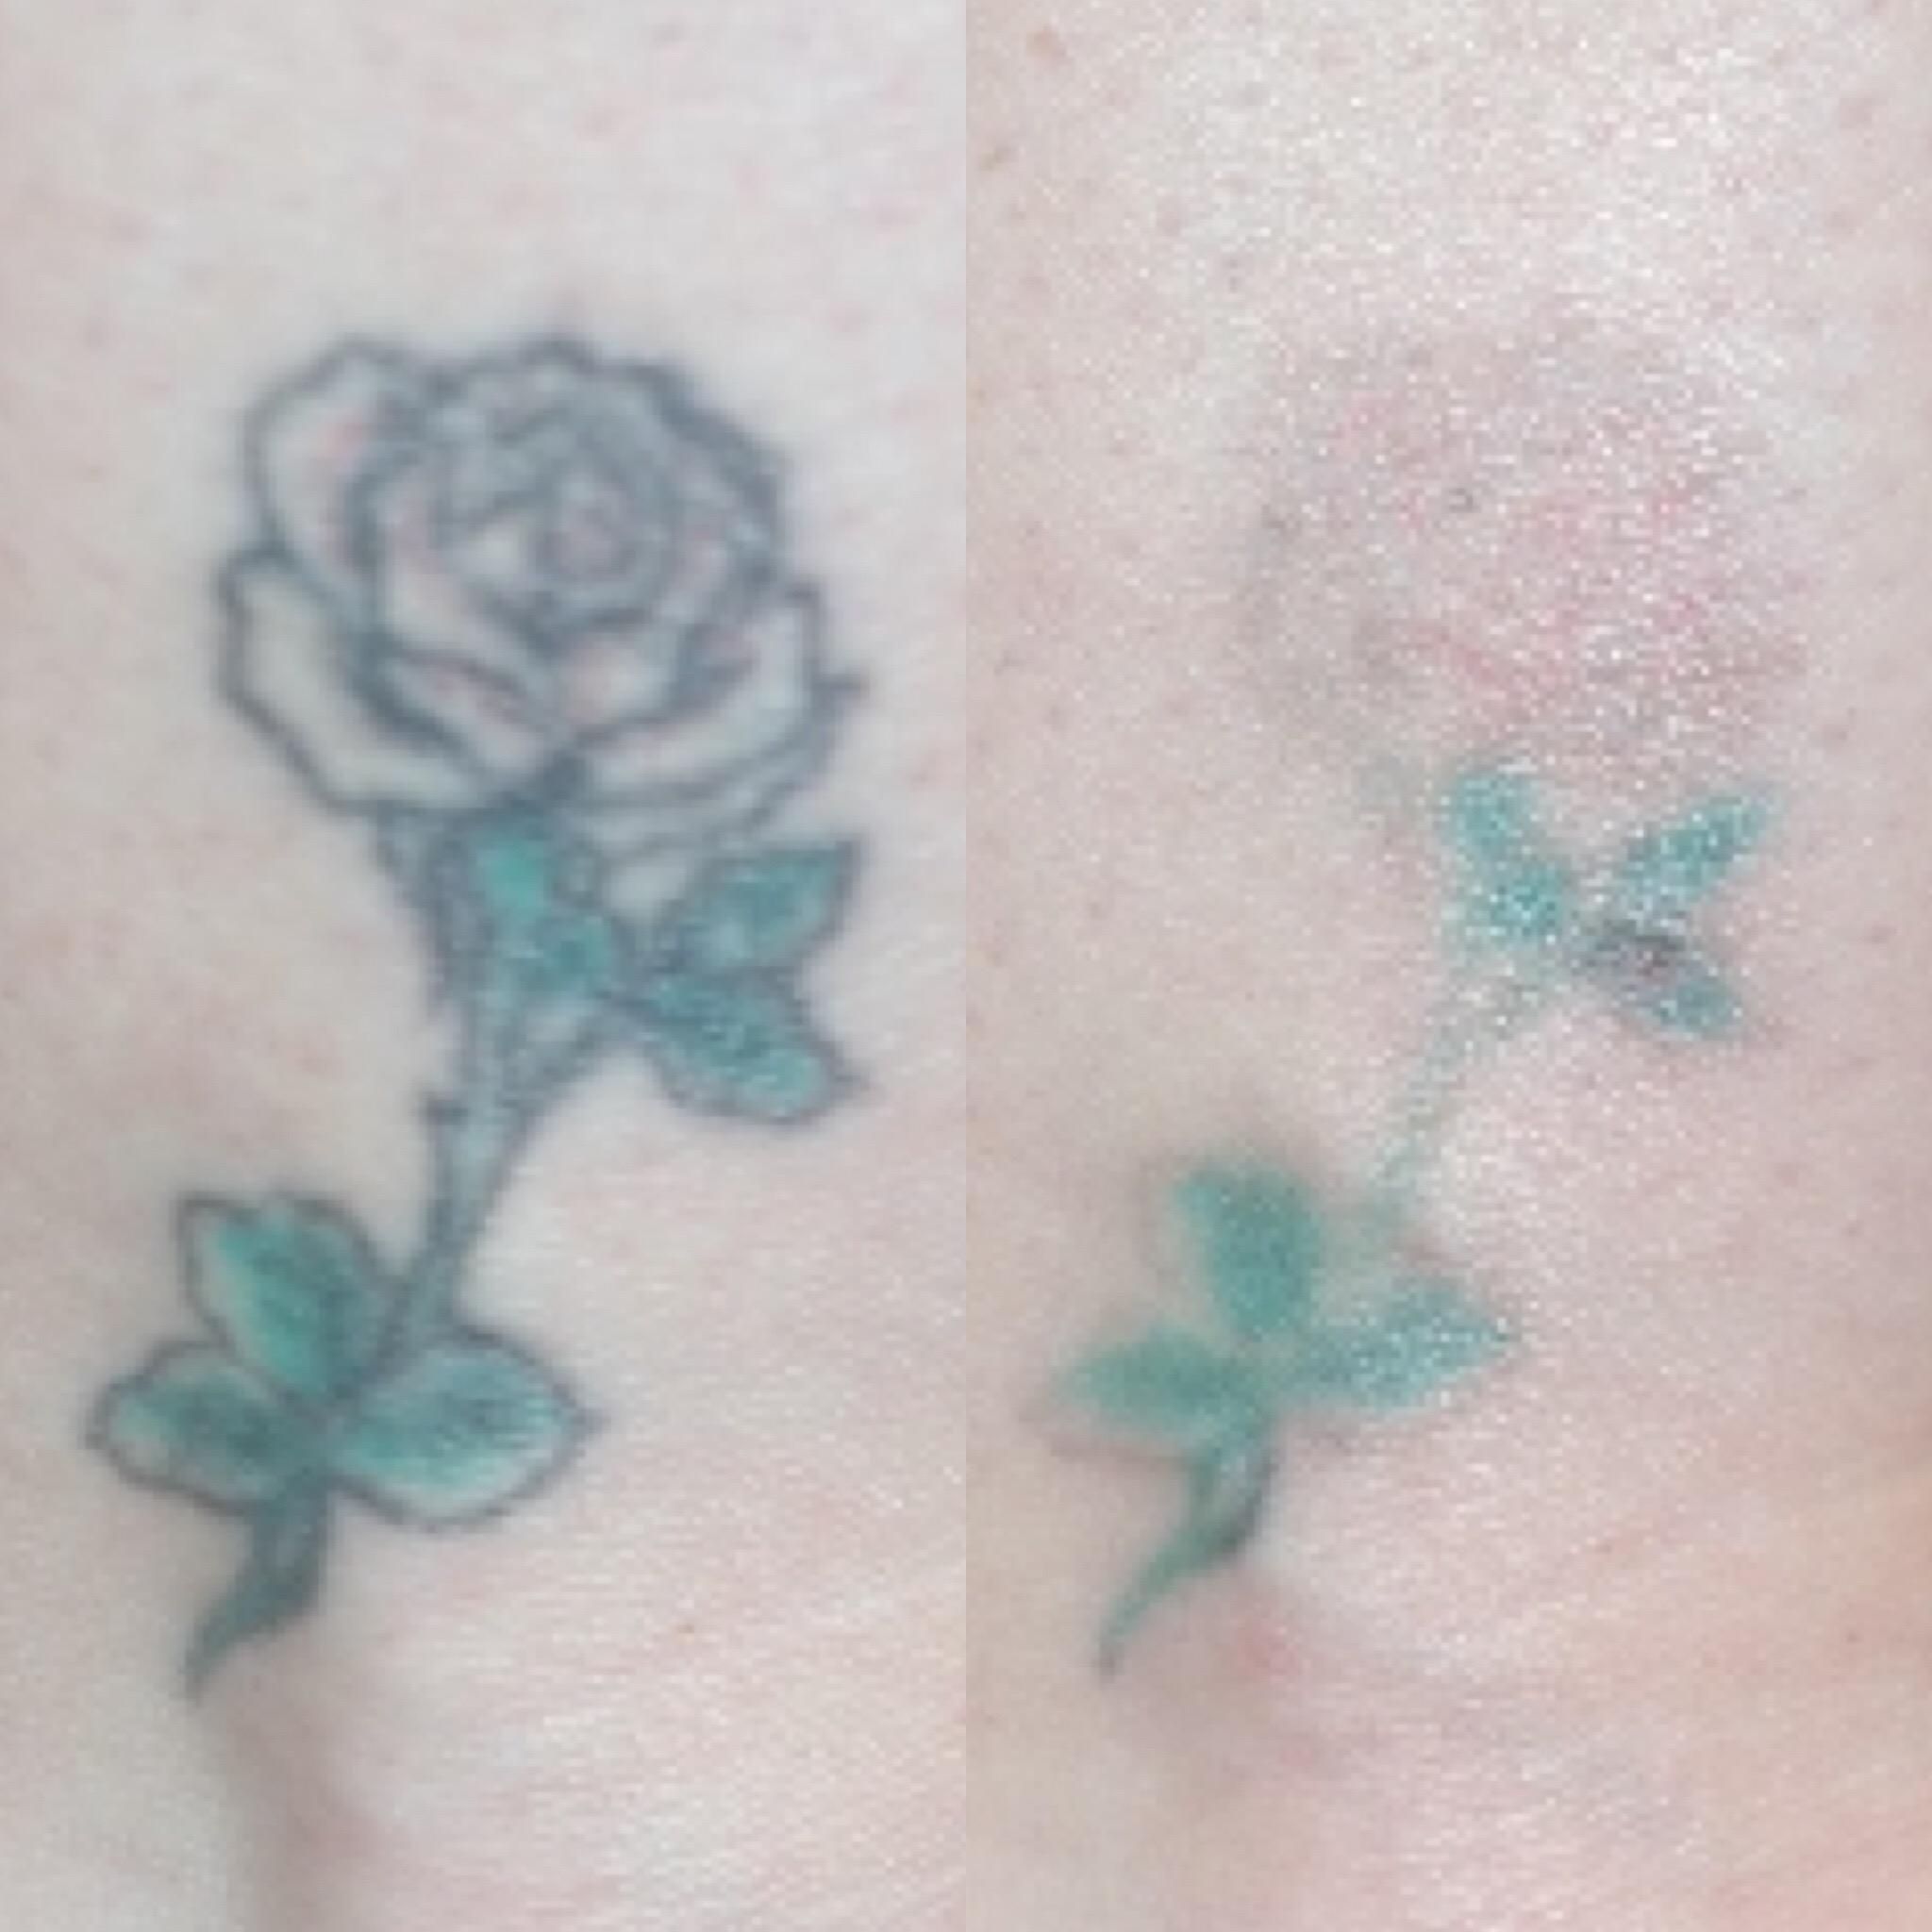 Florida Doctor Introduces Next-Generation Laser Tattoo